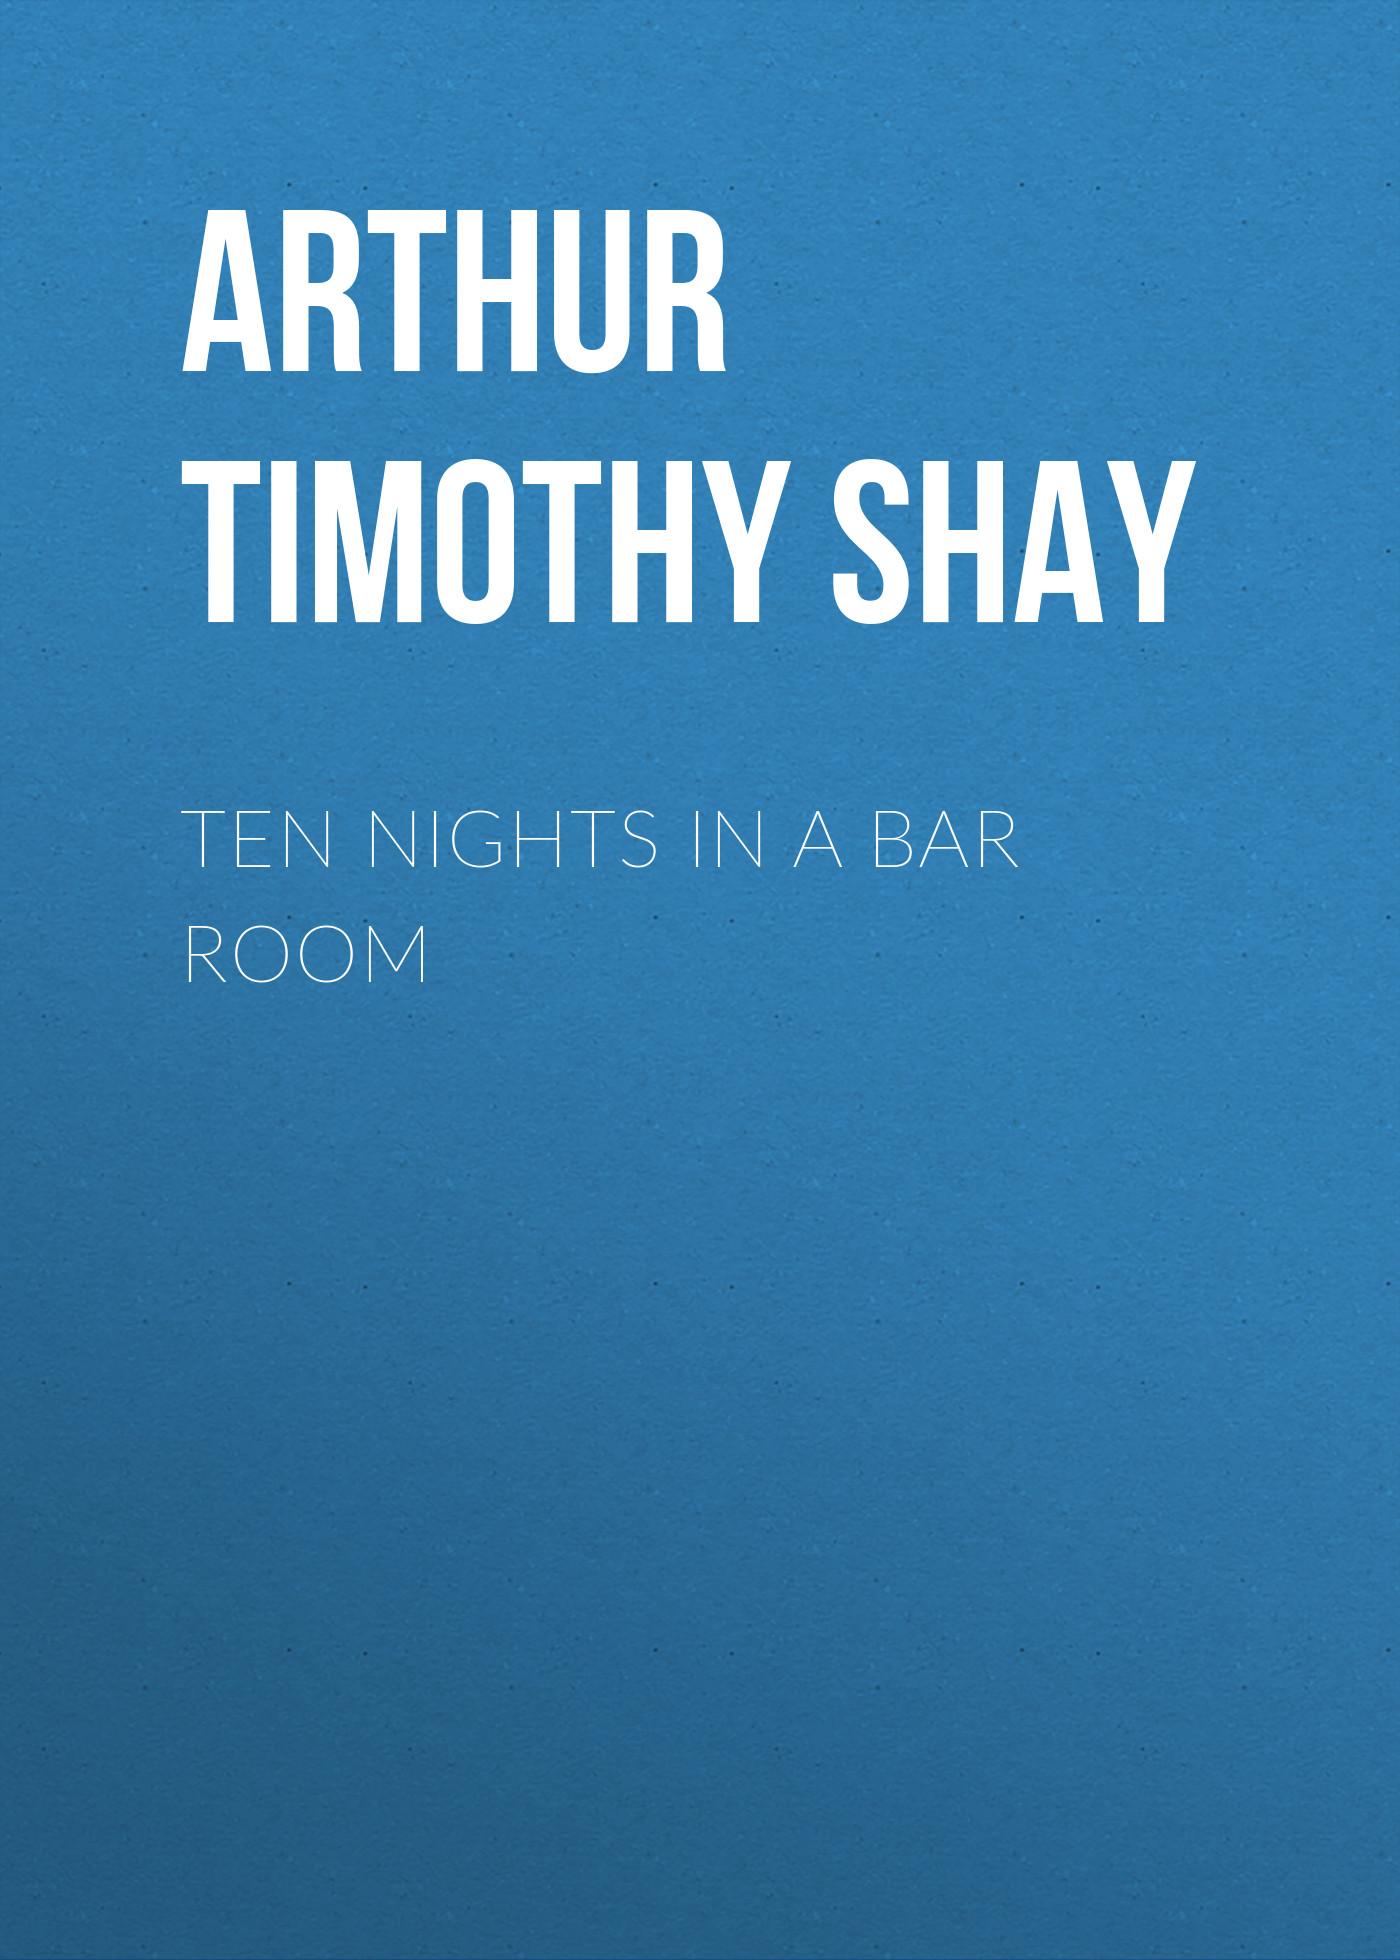 Arthur Timothy Shay Ten Nights in a Bar Room vitaly mushkin erotic stories top ten